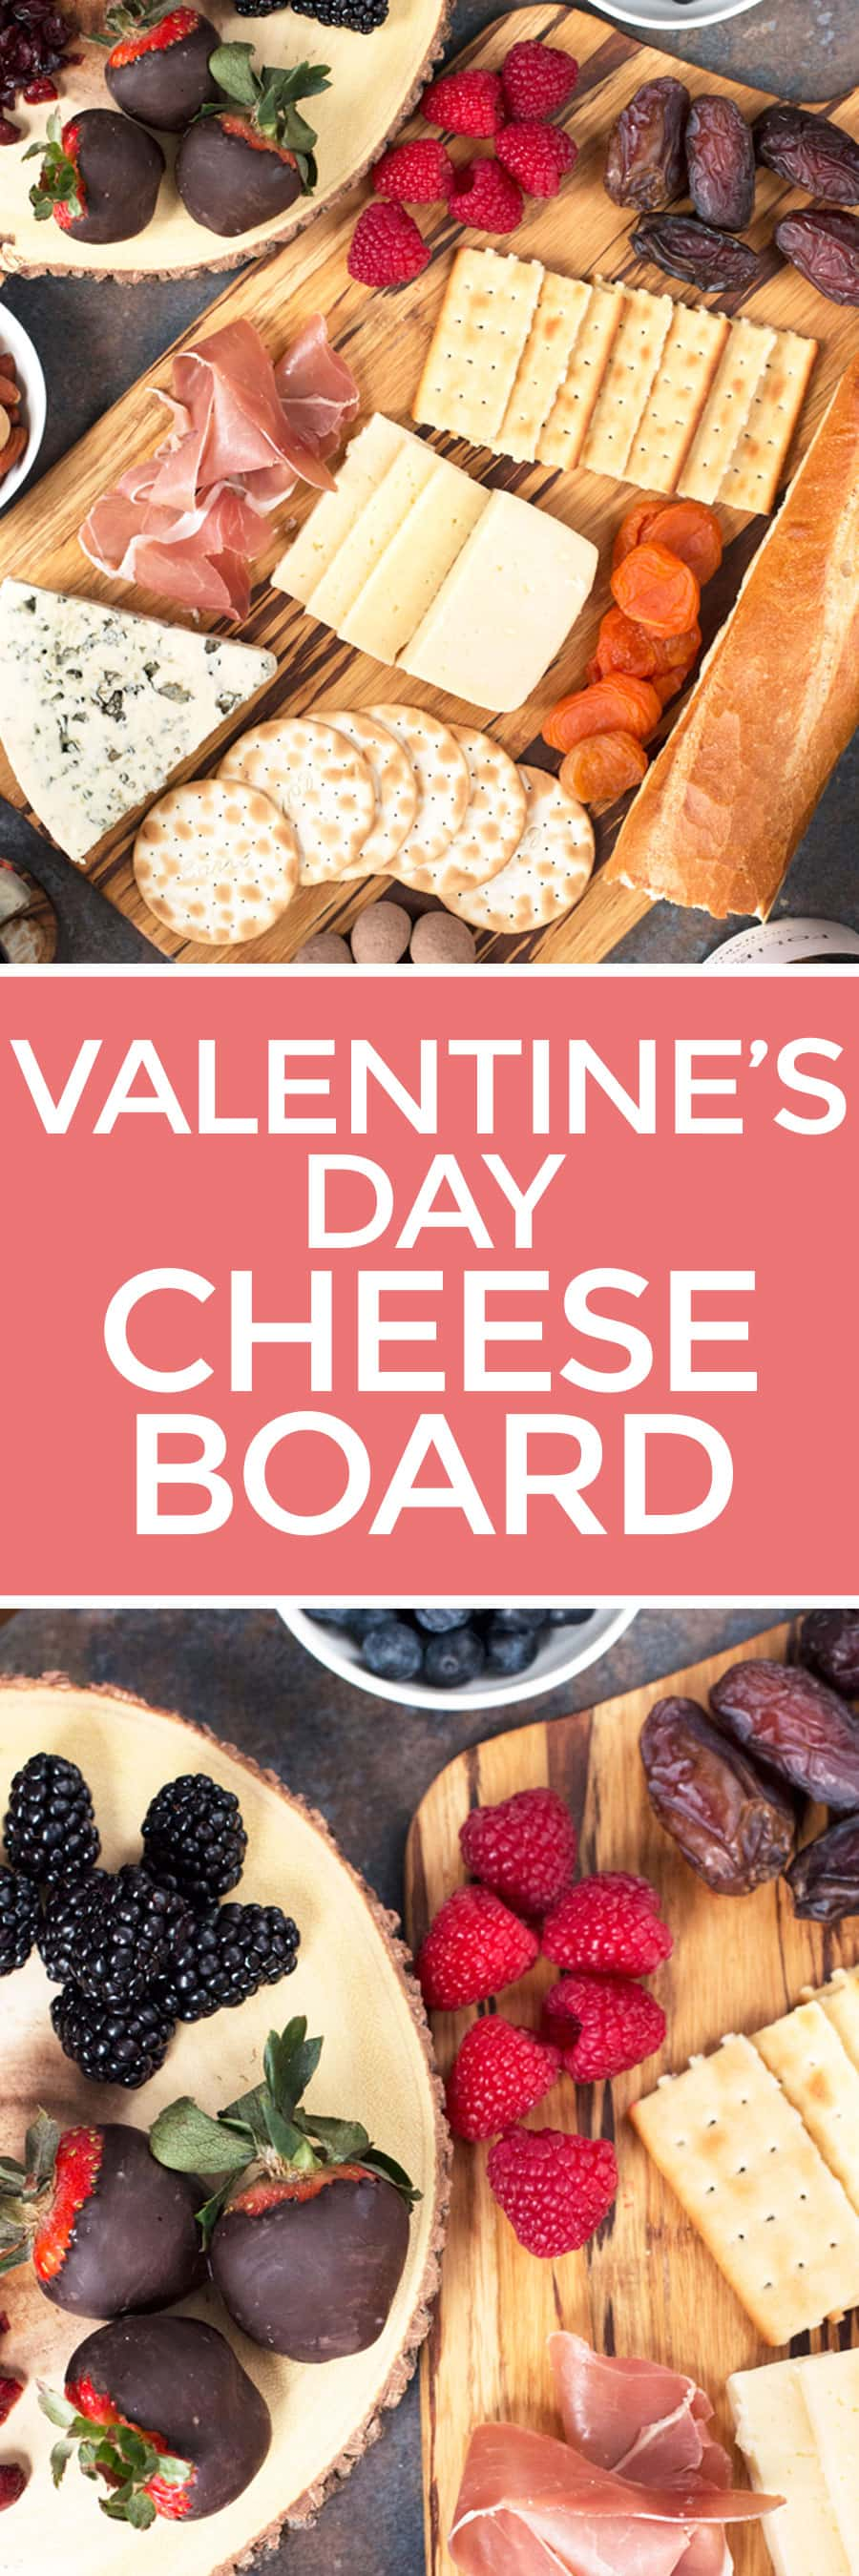 Valentine's Day Cheese Board | cakenknife.com